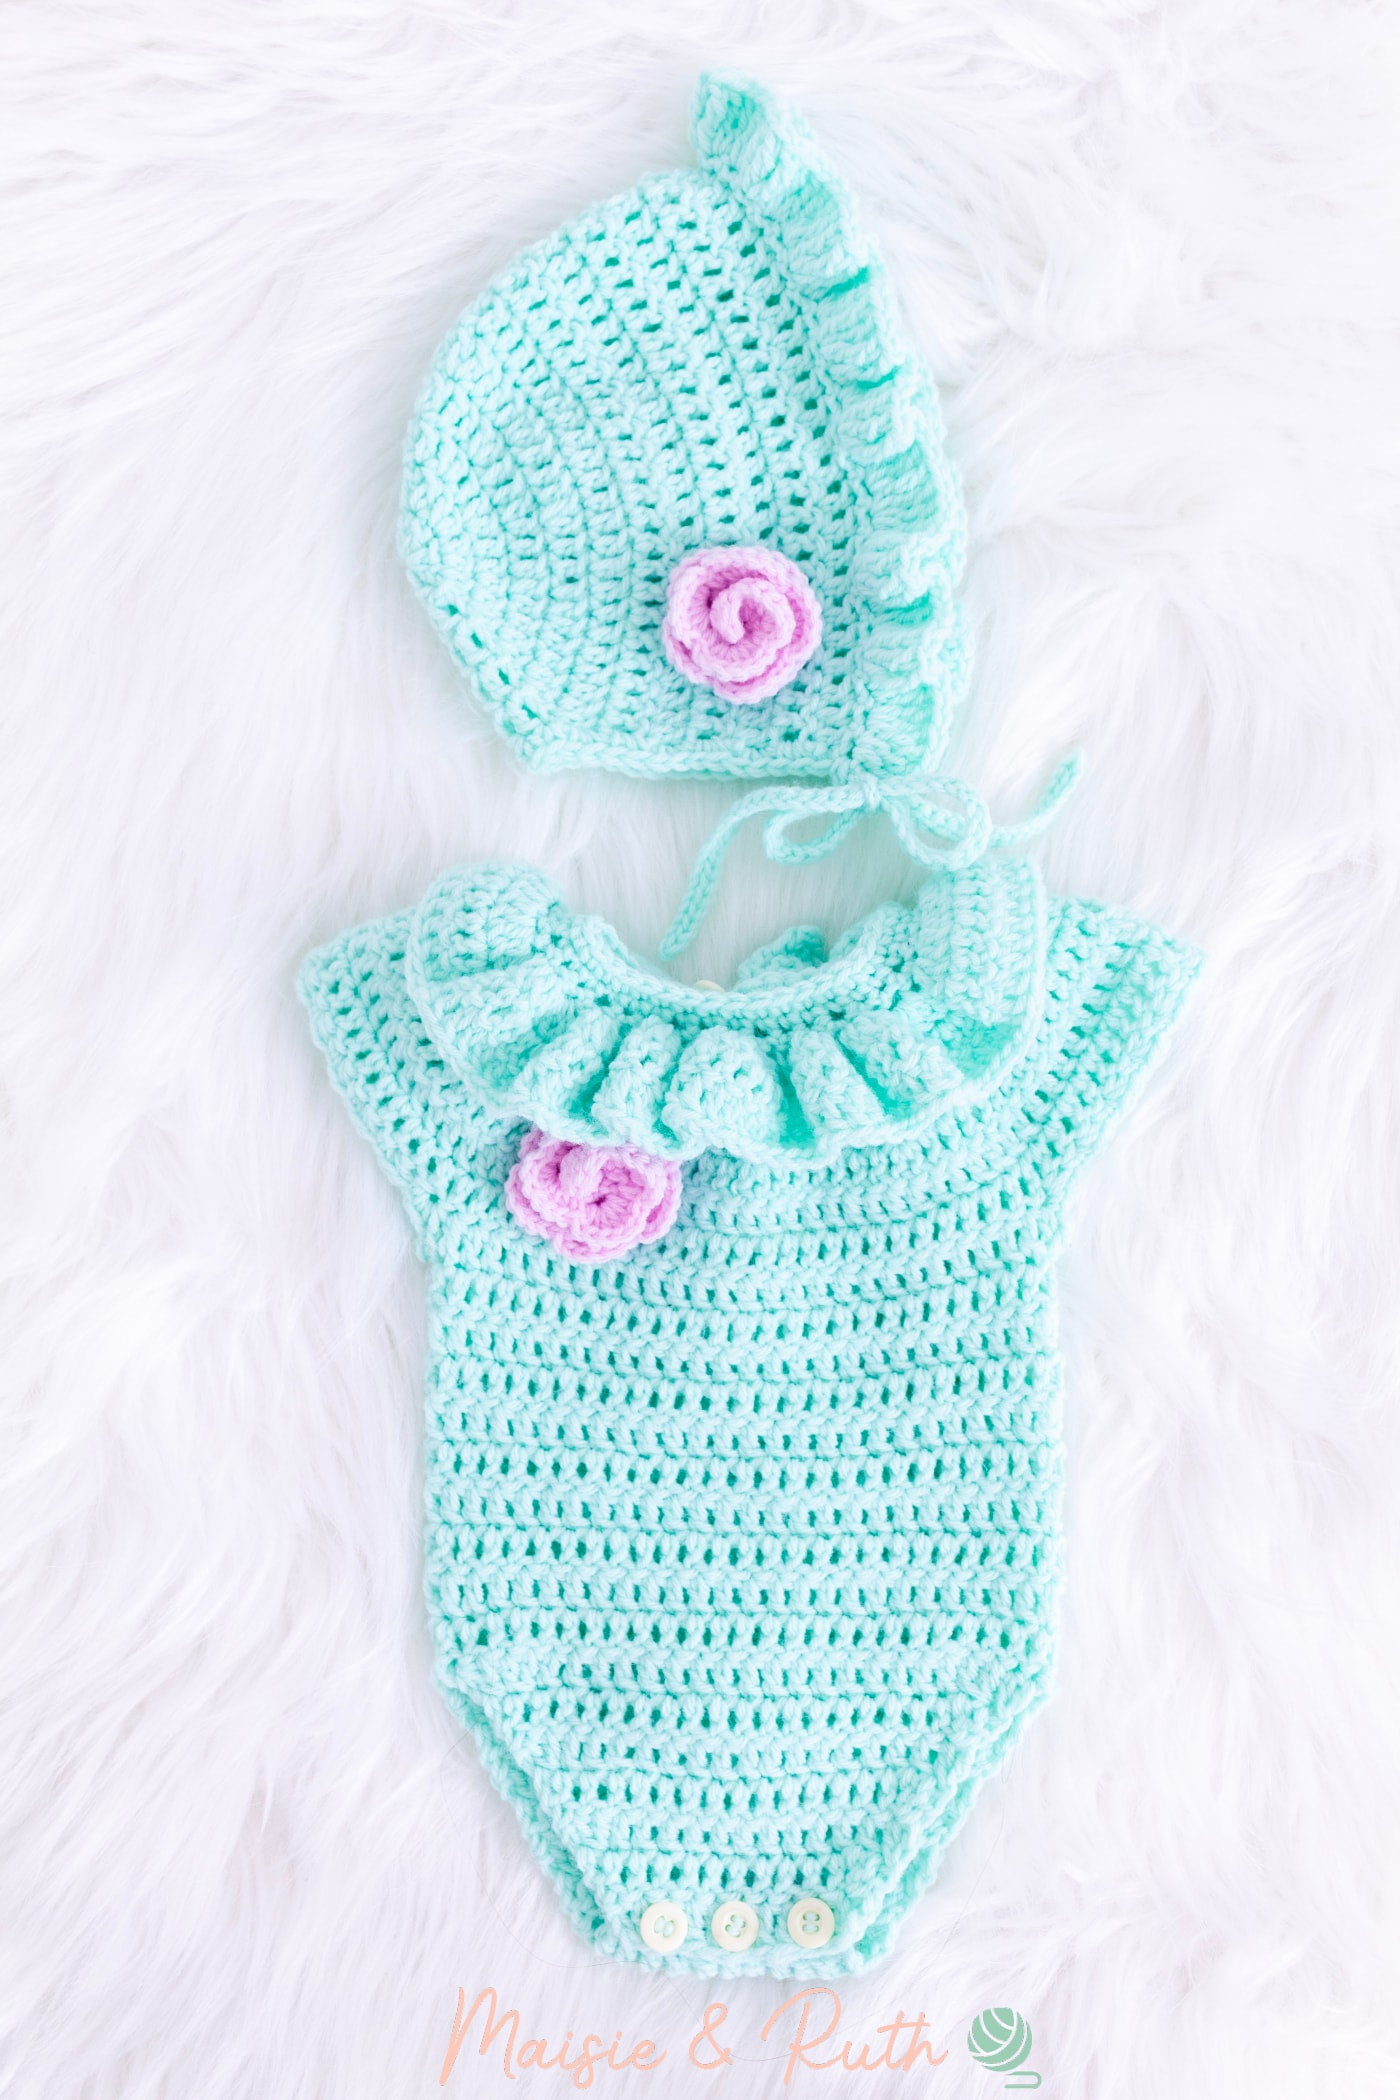 Crochet Baby Hat Pattern with Green Romper